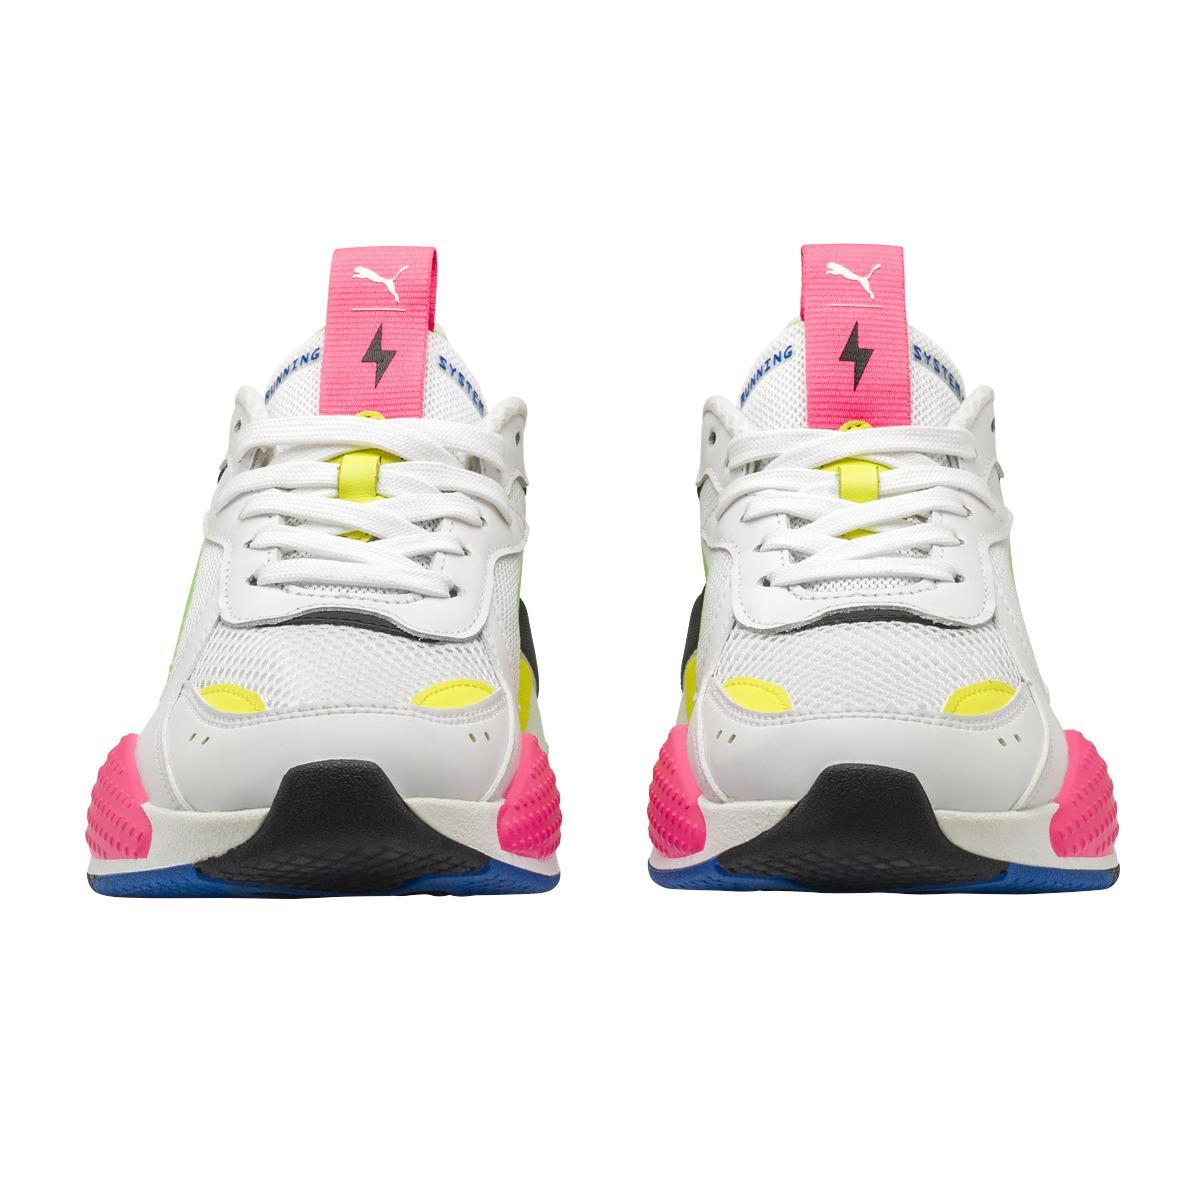 puma rs x toys femme foot locker